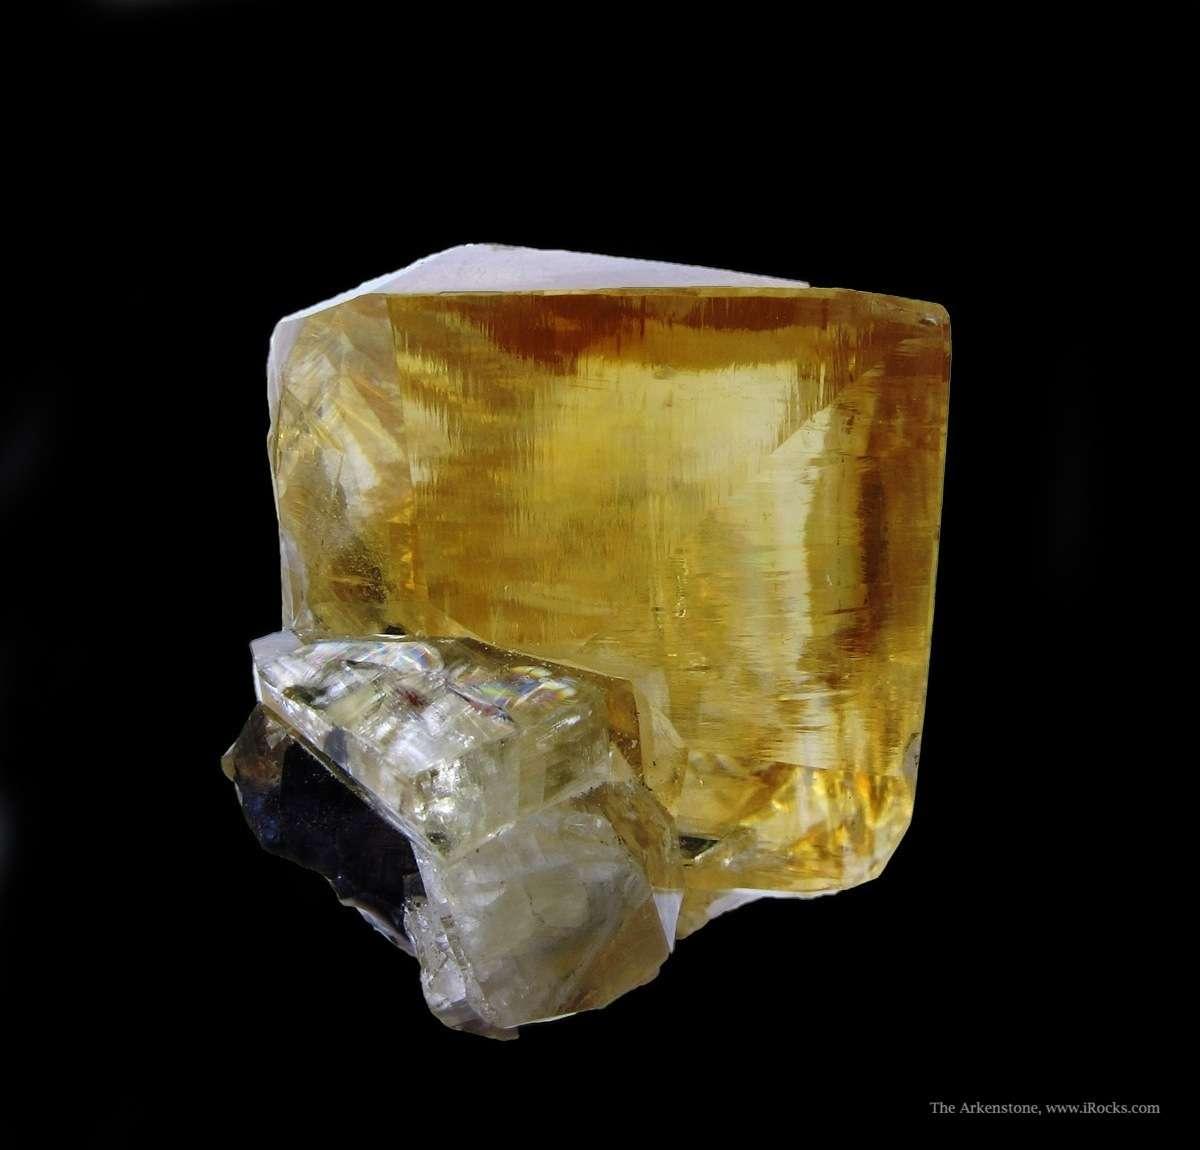 Terrific little Calcite gem mined Denton Mine 1984 The rich amber